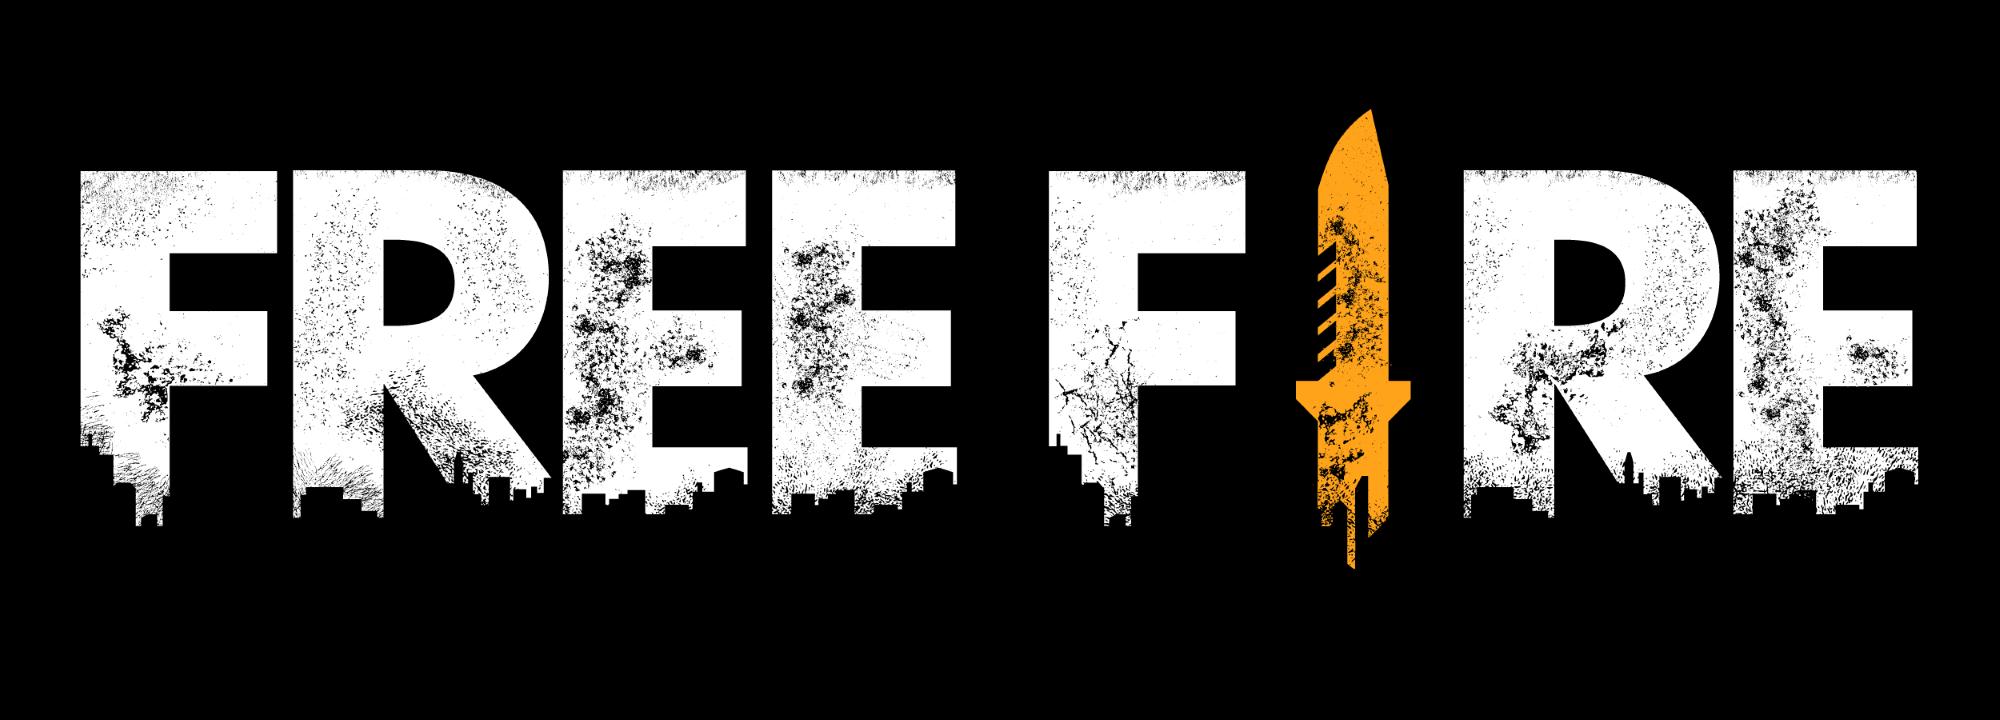 free fire logo 2 - Free Fire Logo